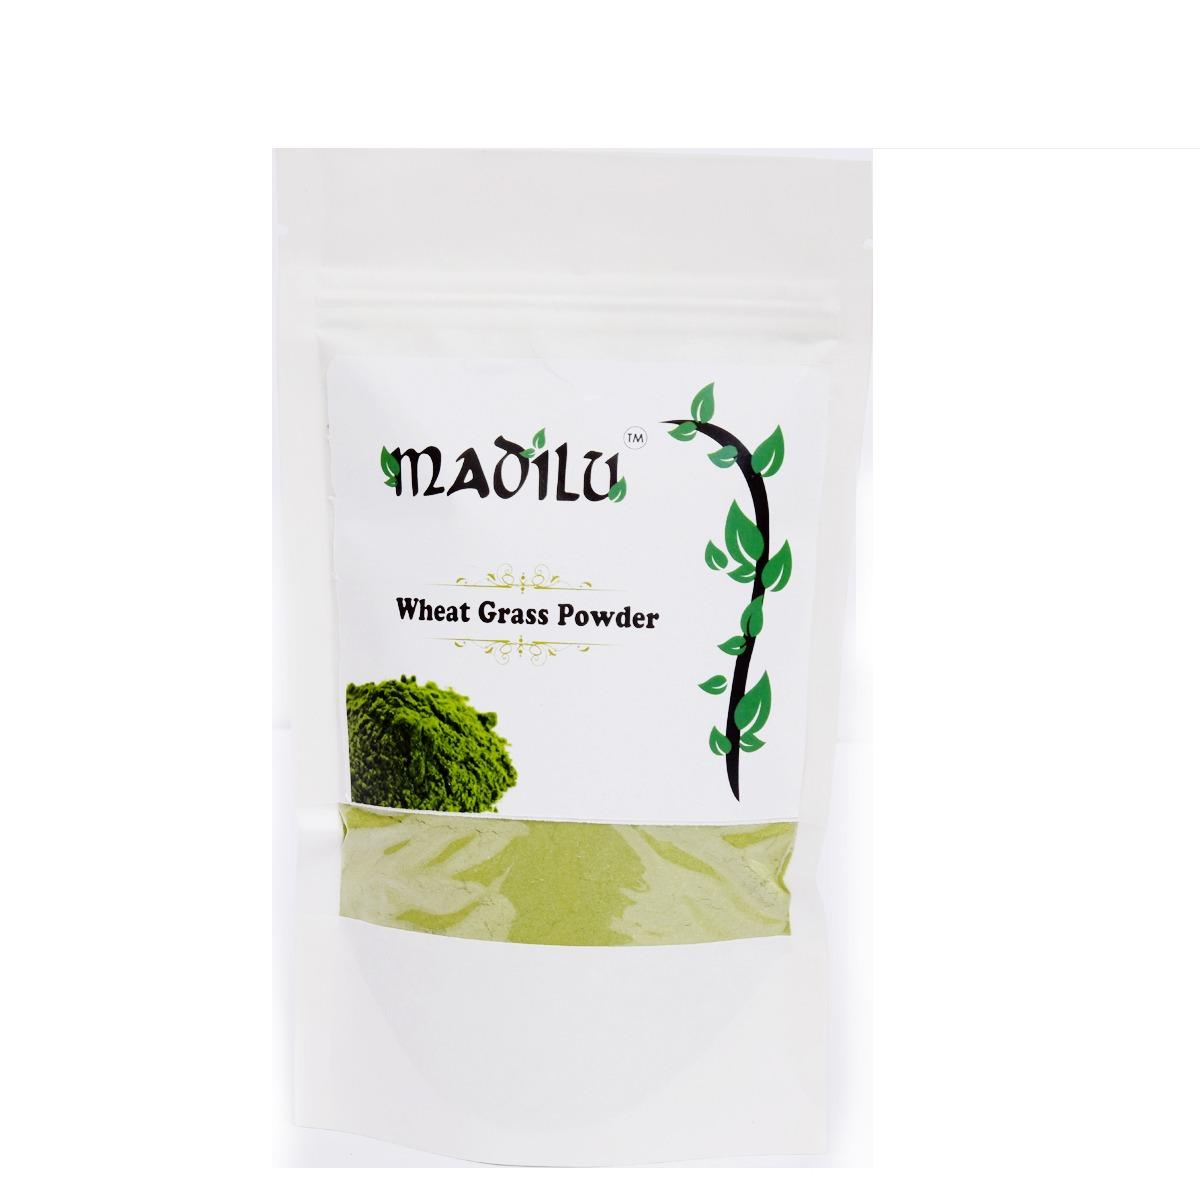 WHEAT GRASS POWDER BY MADILU